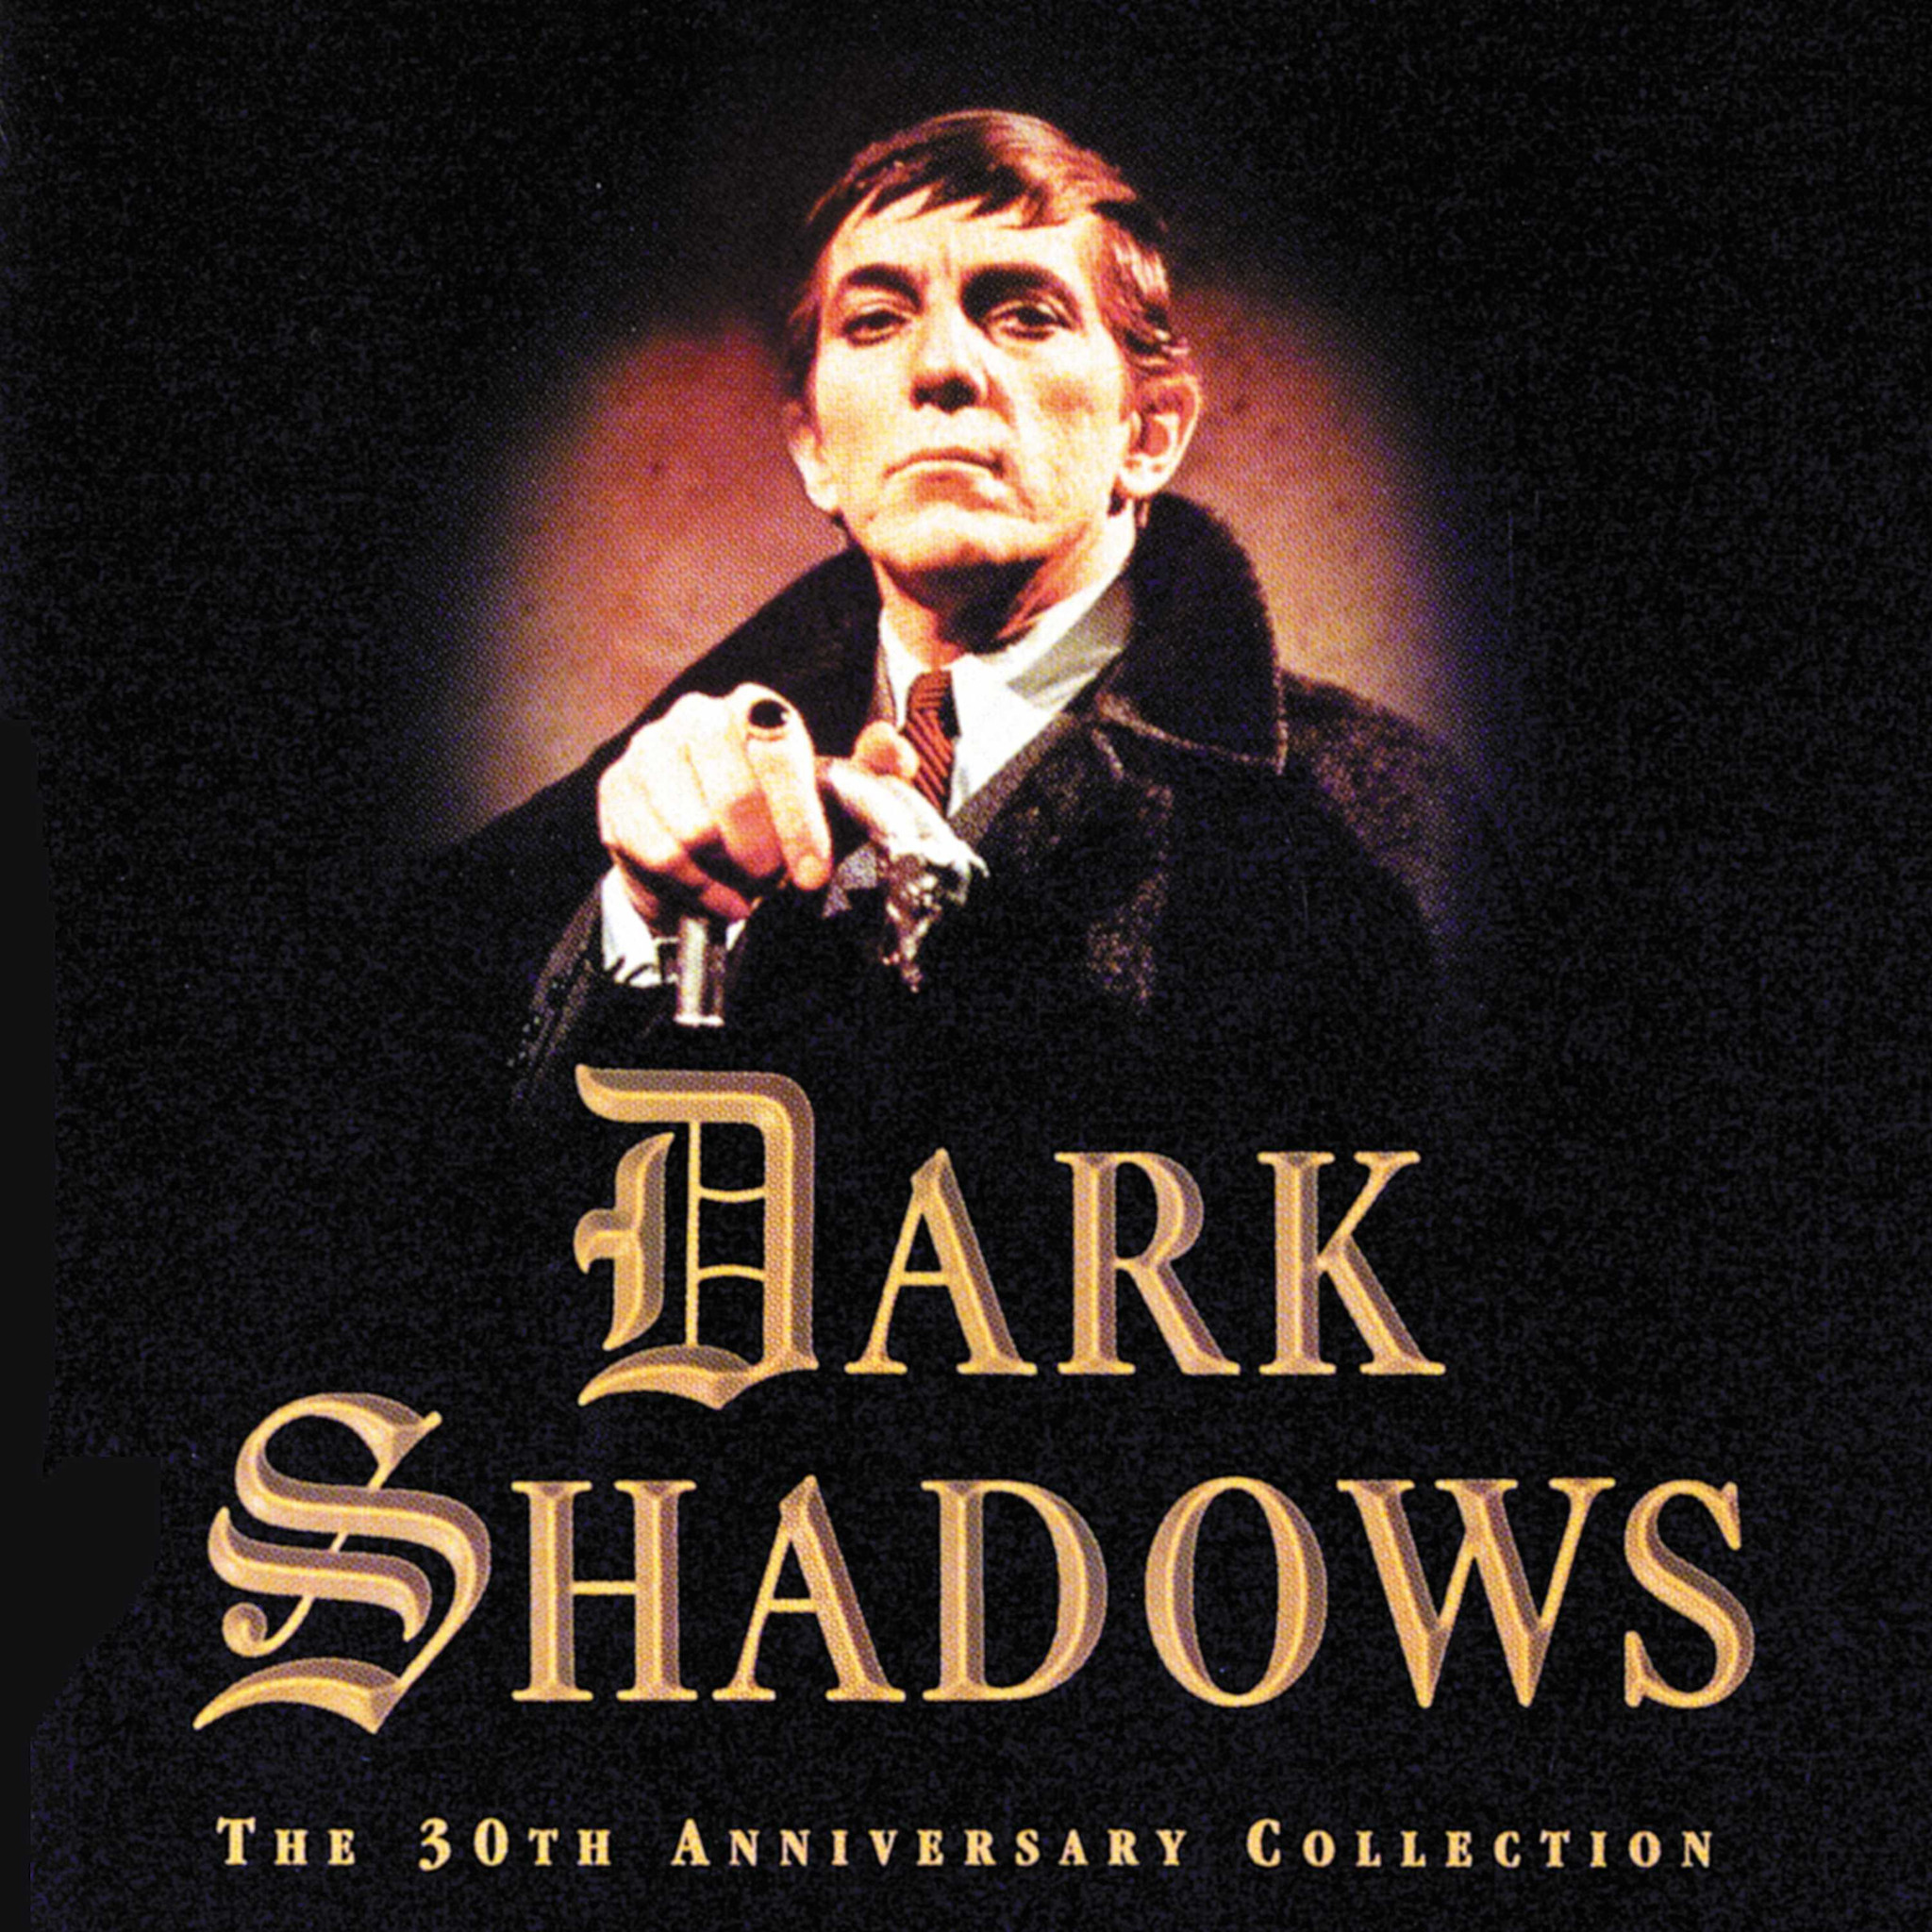 Dark Shadows 30th Anniversary Collection / TV OST - Dark Shadows 30th Anniversary Collection / TV OST - Musik - VARESE SARABANDE - 0030206570229 - May 21, 1996